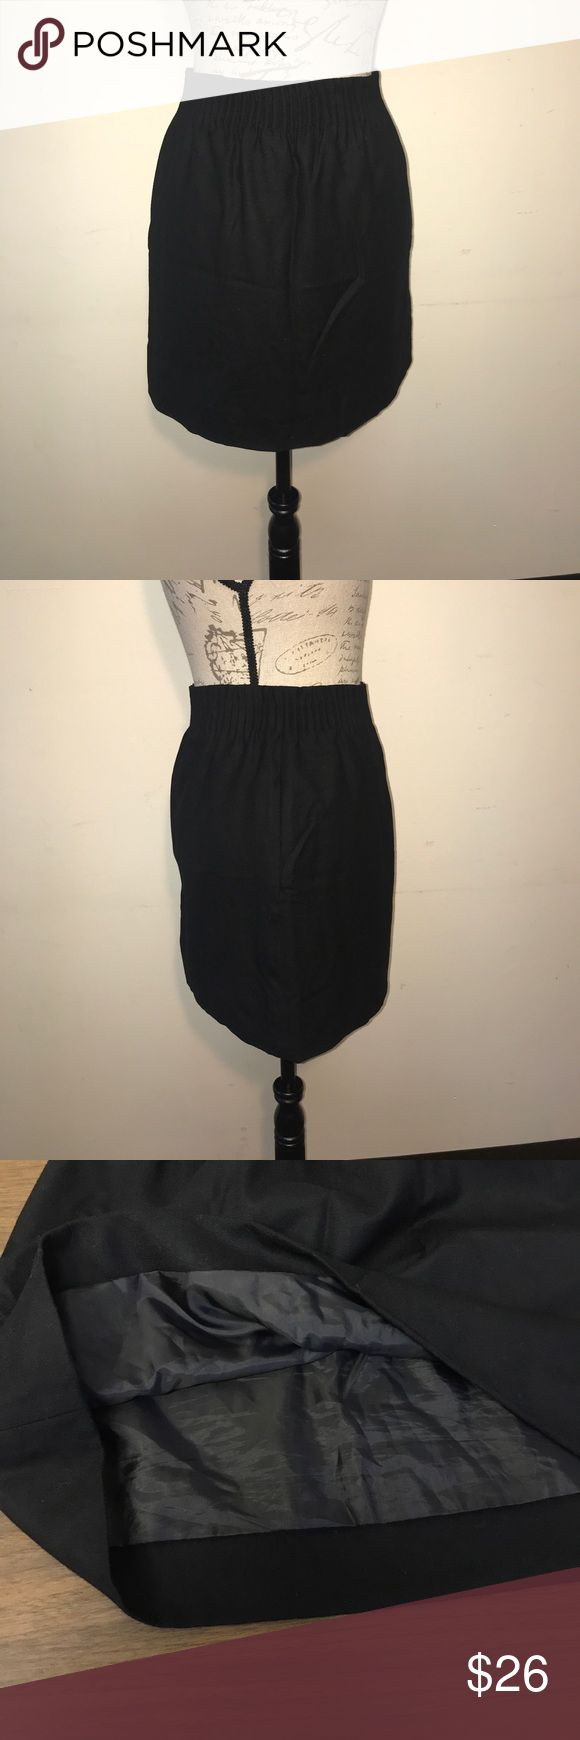 "J. Crew Wool Mini Skirt J. Crew size 0 black wool mini skirt. Top 2.25"" of Skirt has elastic waist & it's puckered. On seam-side pockets. Fully lined. Laid flat waist: 13"", hips: 20"", length:17"". Shell: 97% Wool 3% Elastane. Lining: 100% Polyester. Like new! Retail: $89.50 J. Crew Skirts Mini"